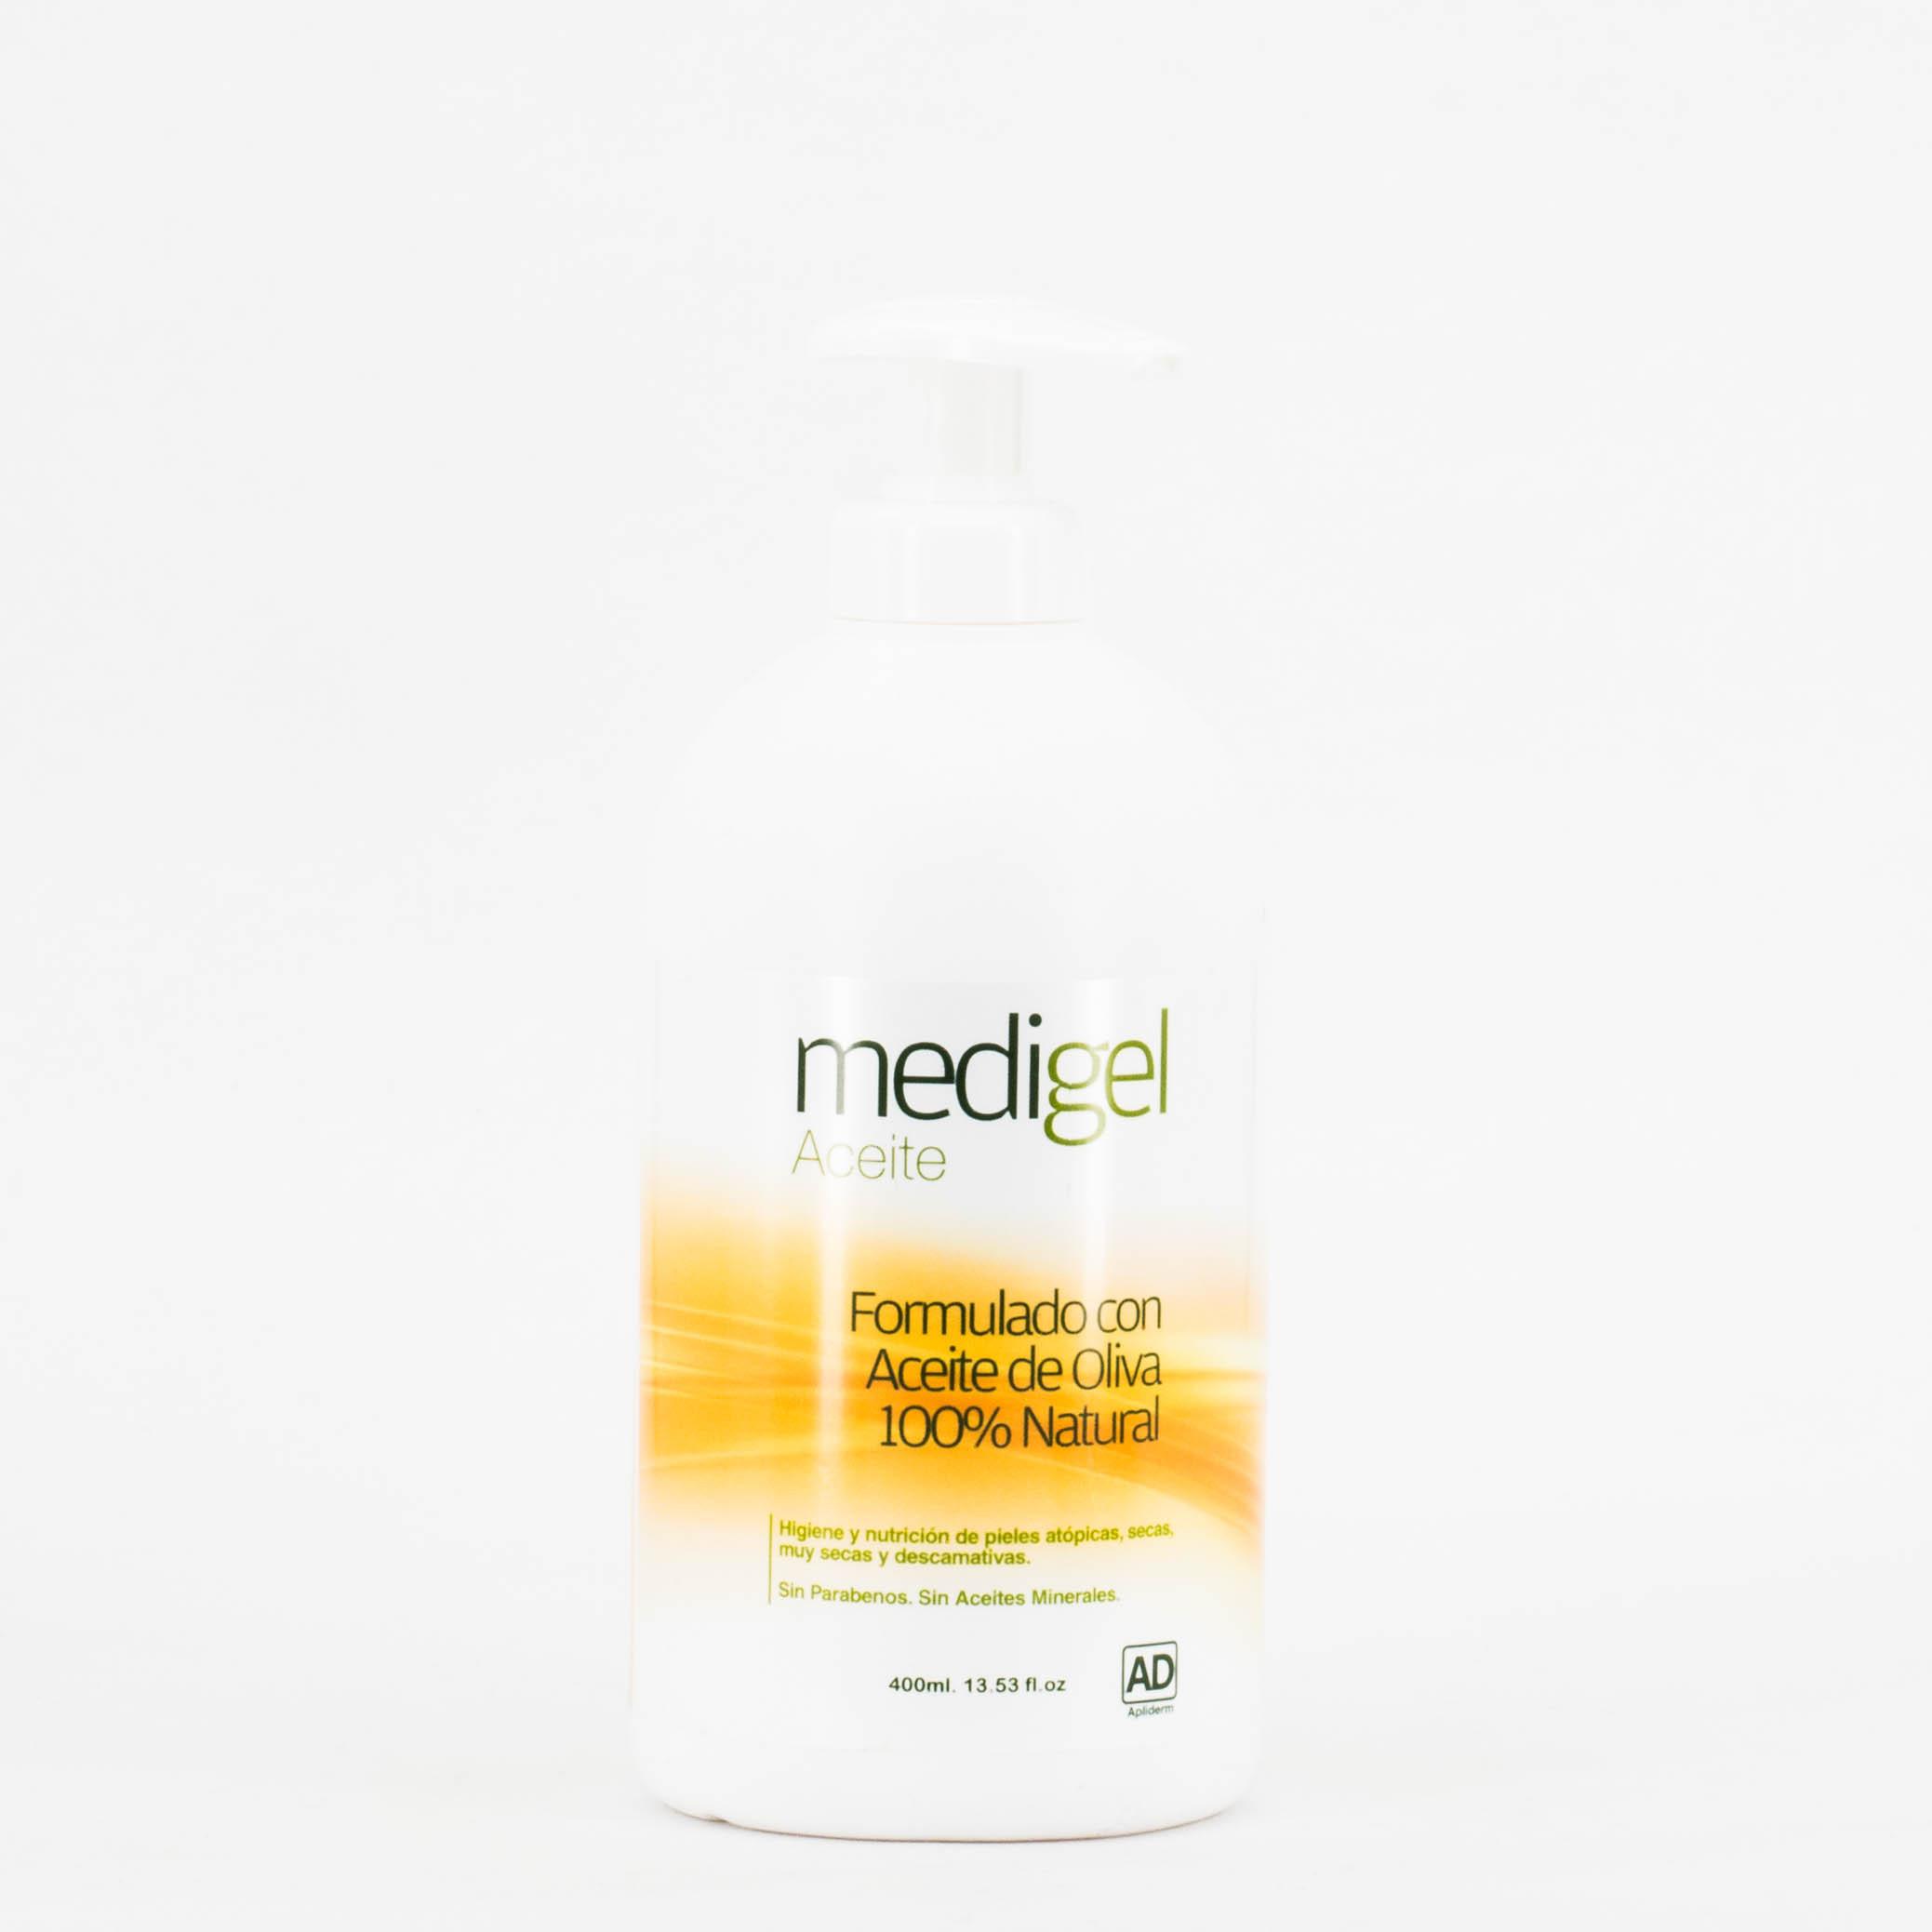 Medigel Aceite de baño y ducha 400ml